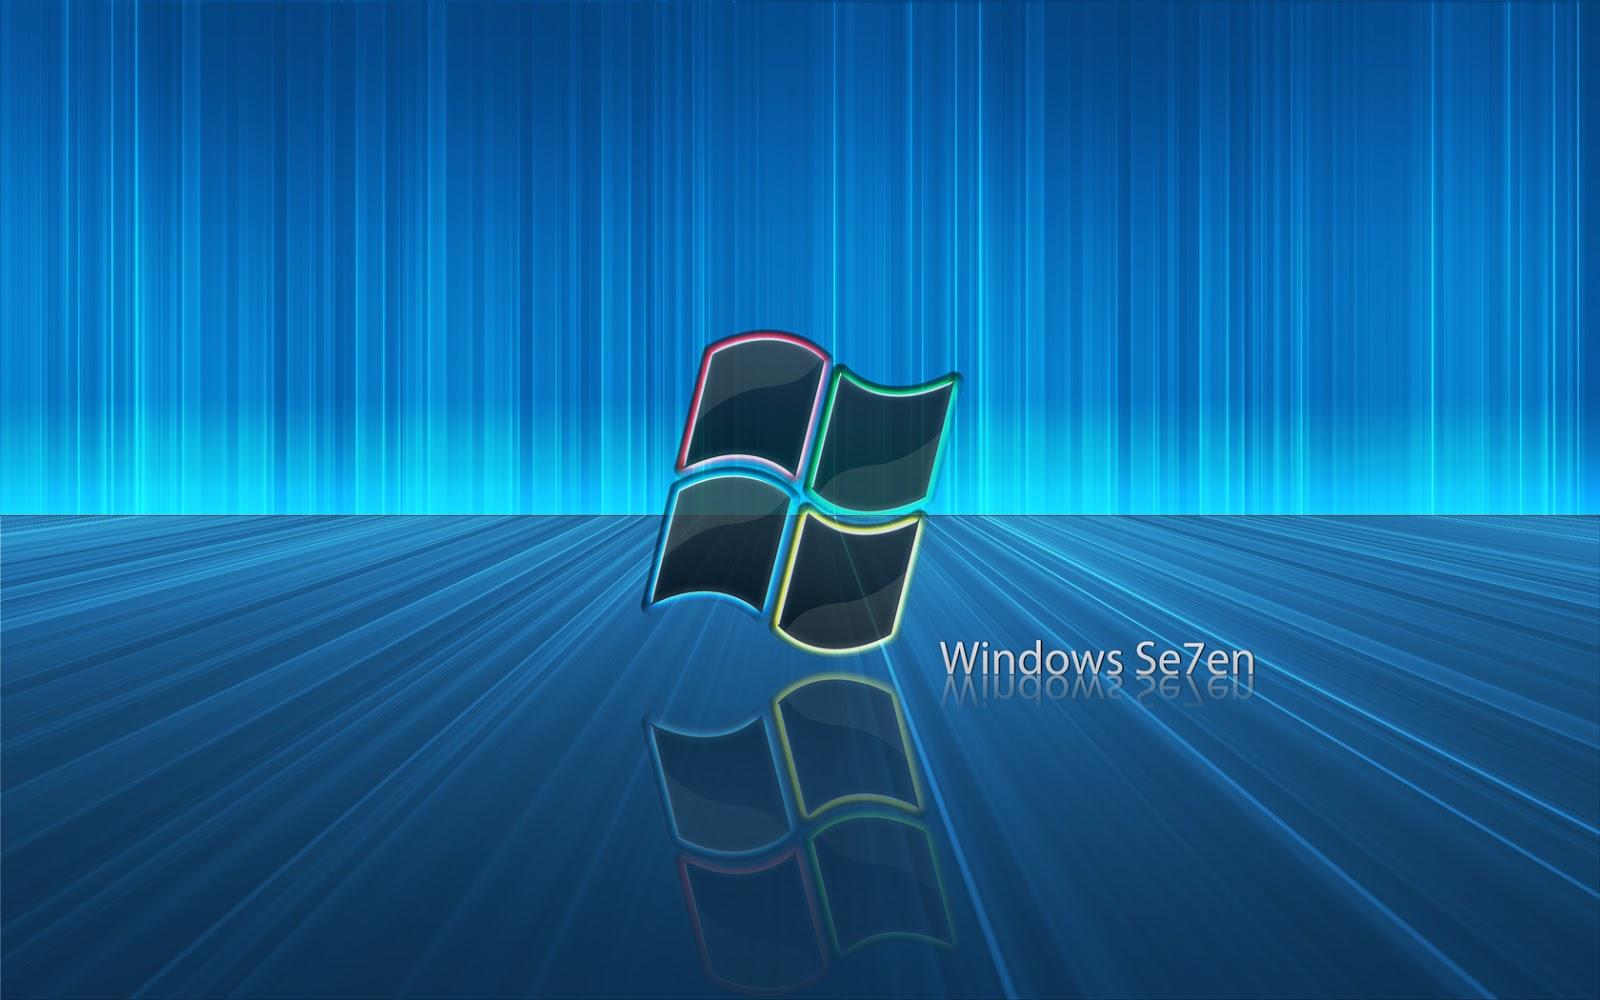 Microsoft Wallpaper Desktop Download   Best Window 7 Background Hd 1600x1000